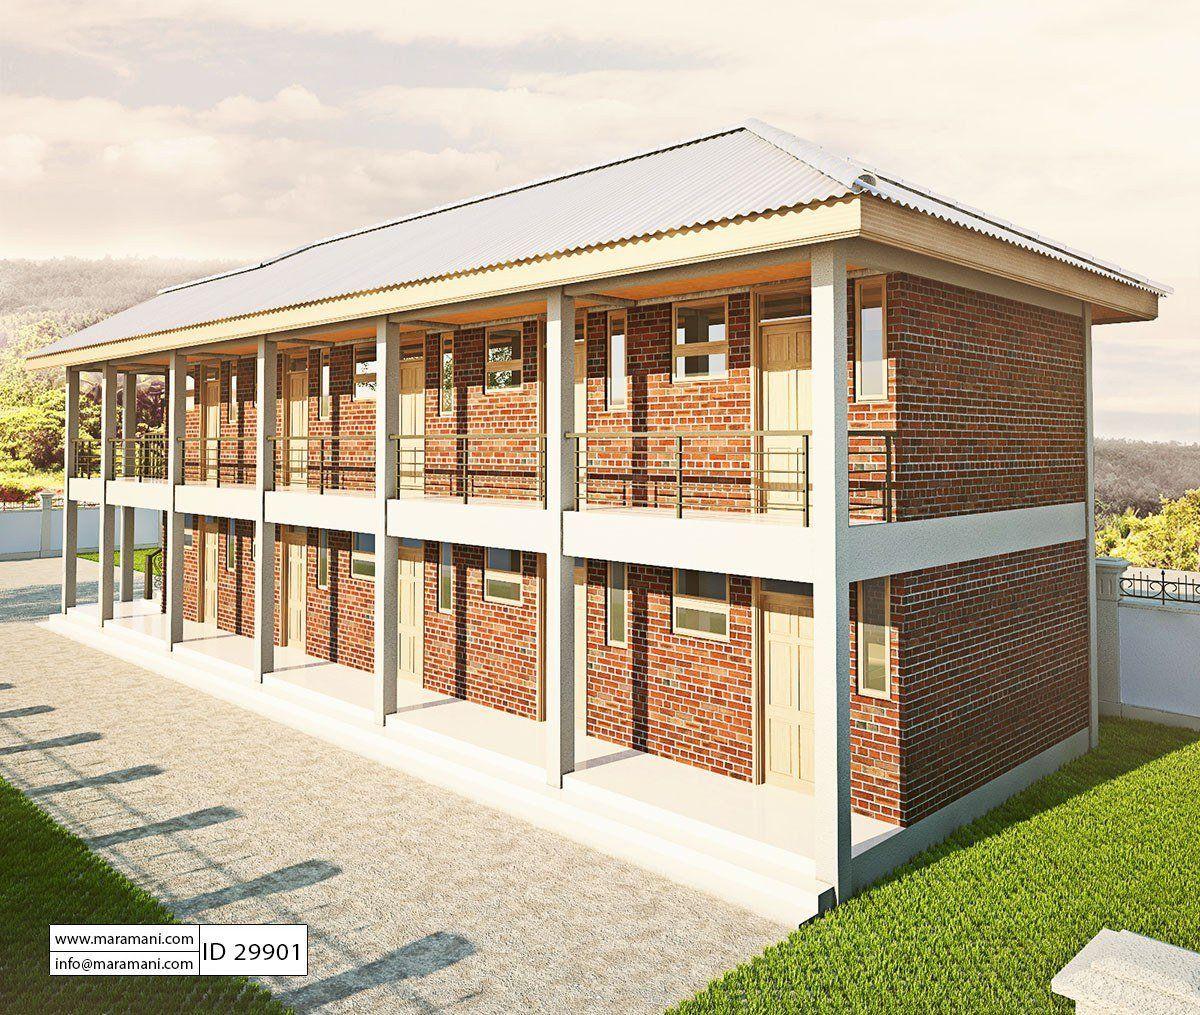 10 Bedroom Hostel Design Id 29901 House Plans By Maramani Hostels Design Small Apartment Building Design Bungalow House Design